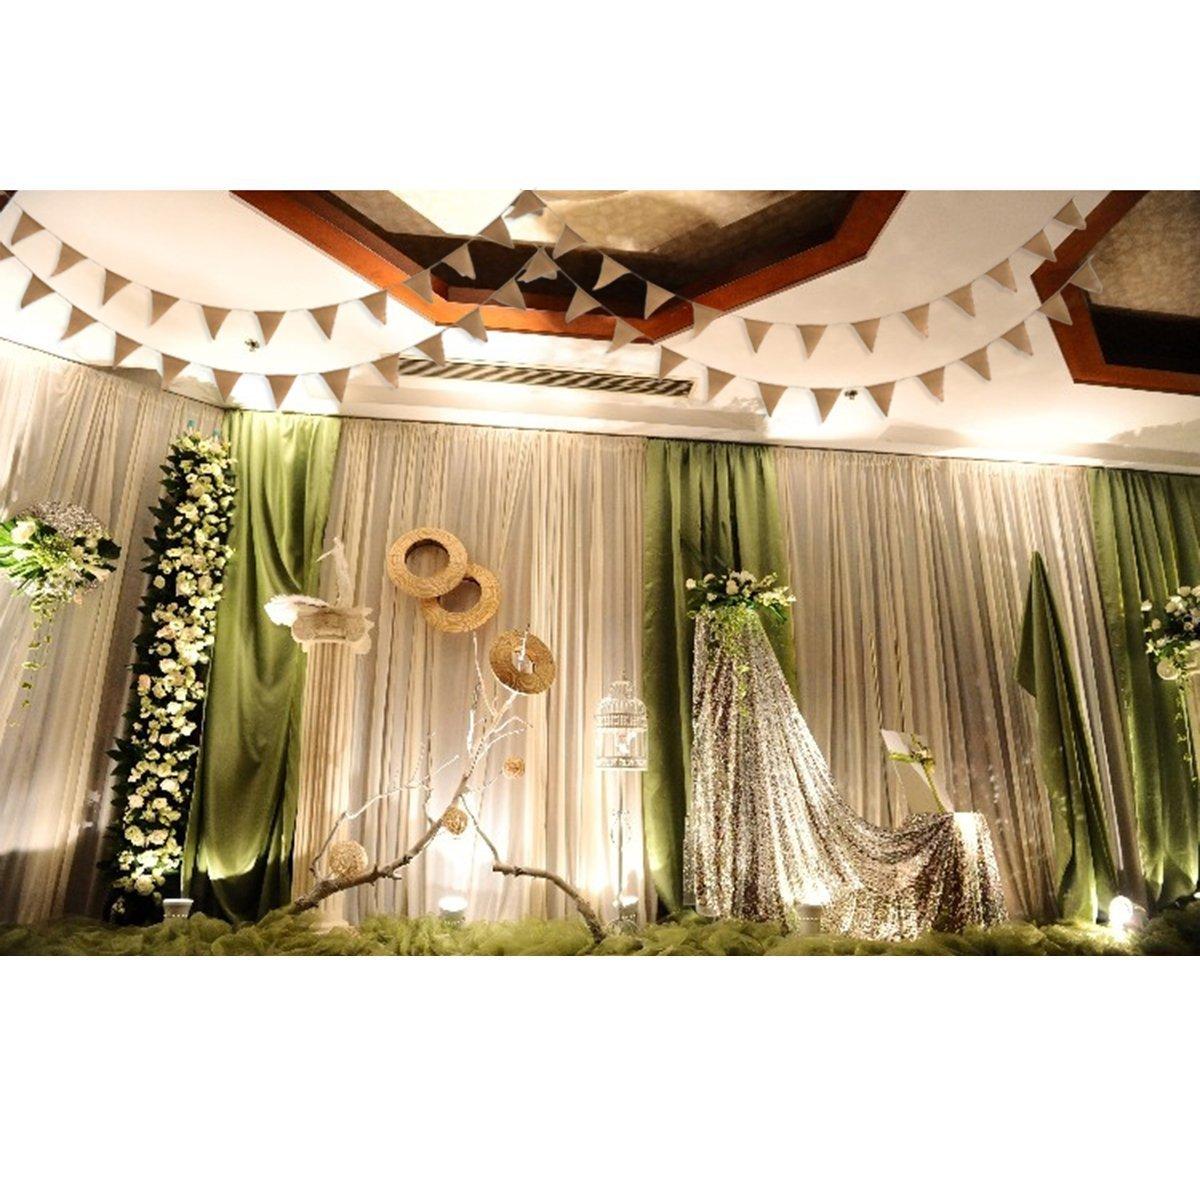 Ovee Lando 9 Foot Burlap Banner Vintage Bunting Banner with 13pcs Flags DIY Wedding Birthday Party Decoration 2 pack OveeLando